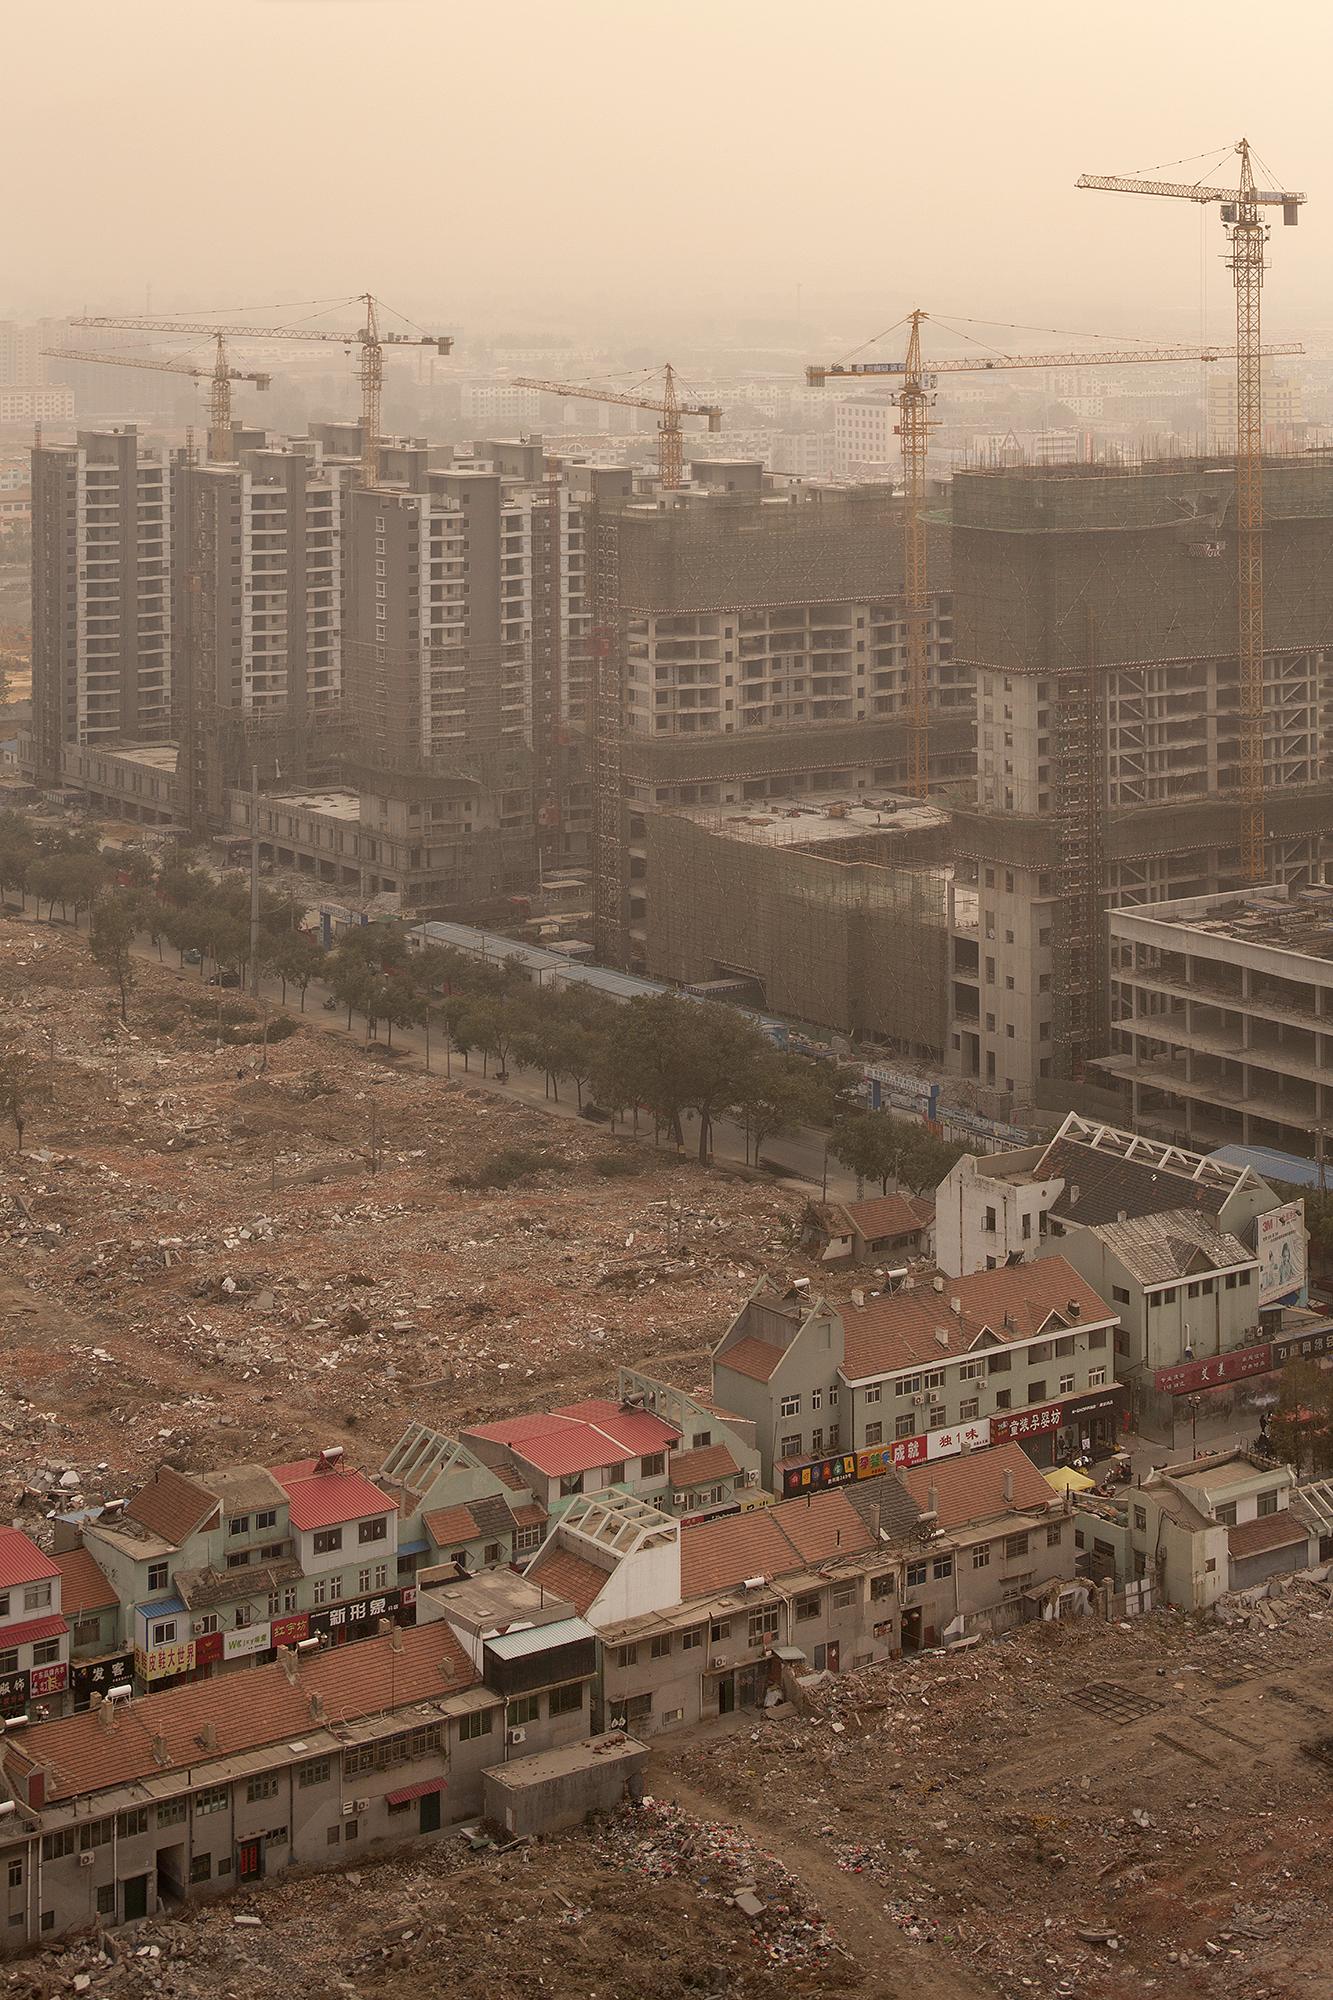 nic-lehoux_dystopia-project-25_chongqing-and-shanghai-china_008.jpg